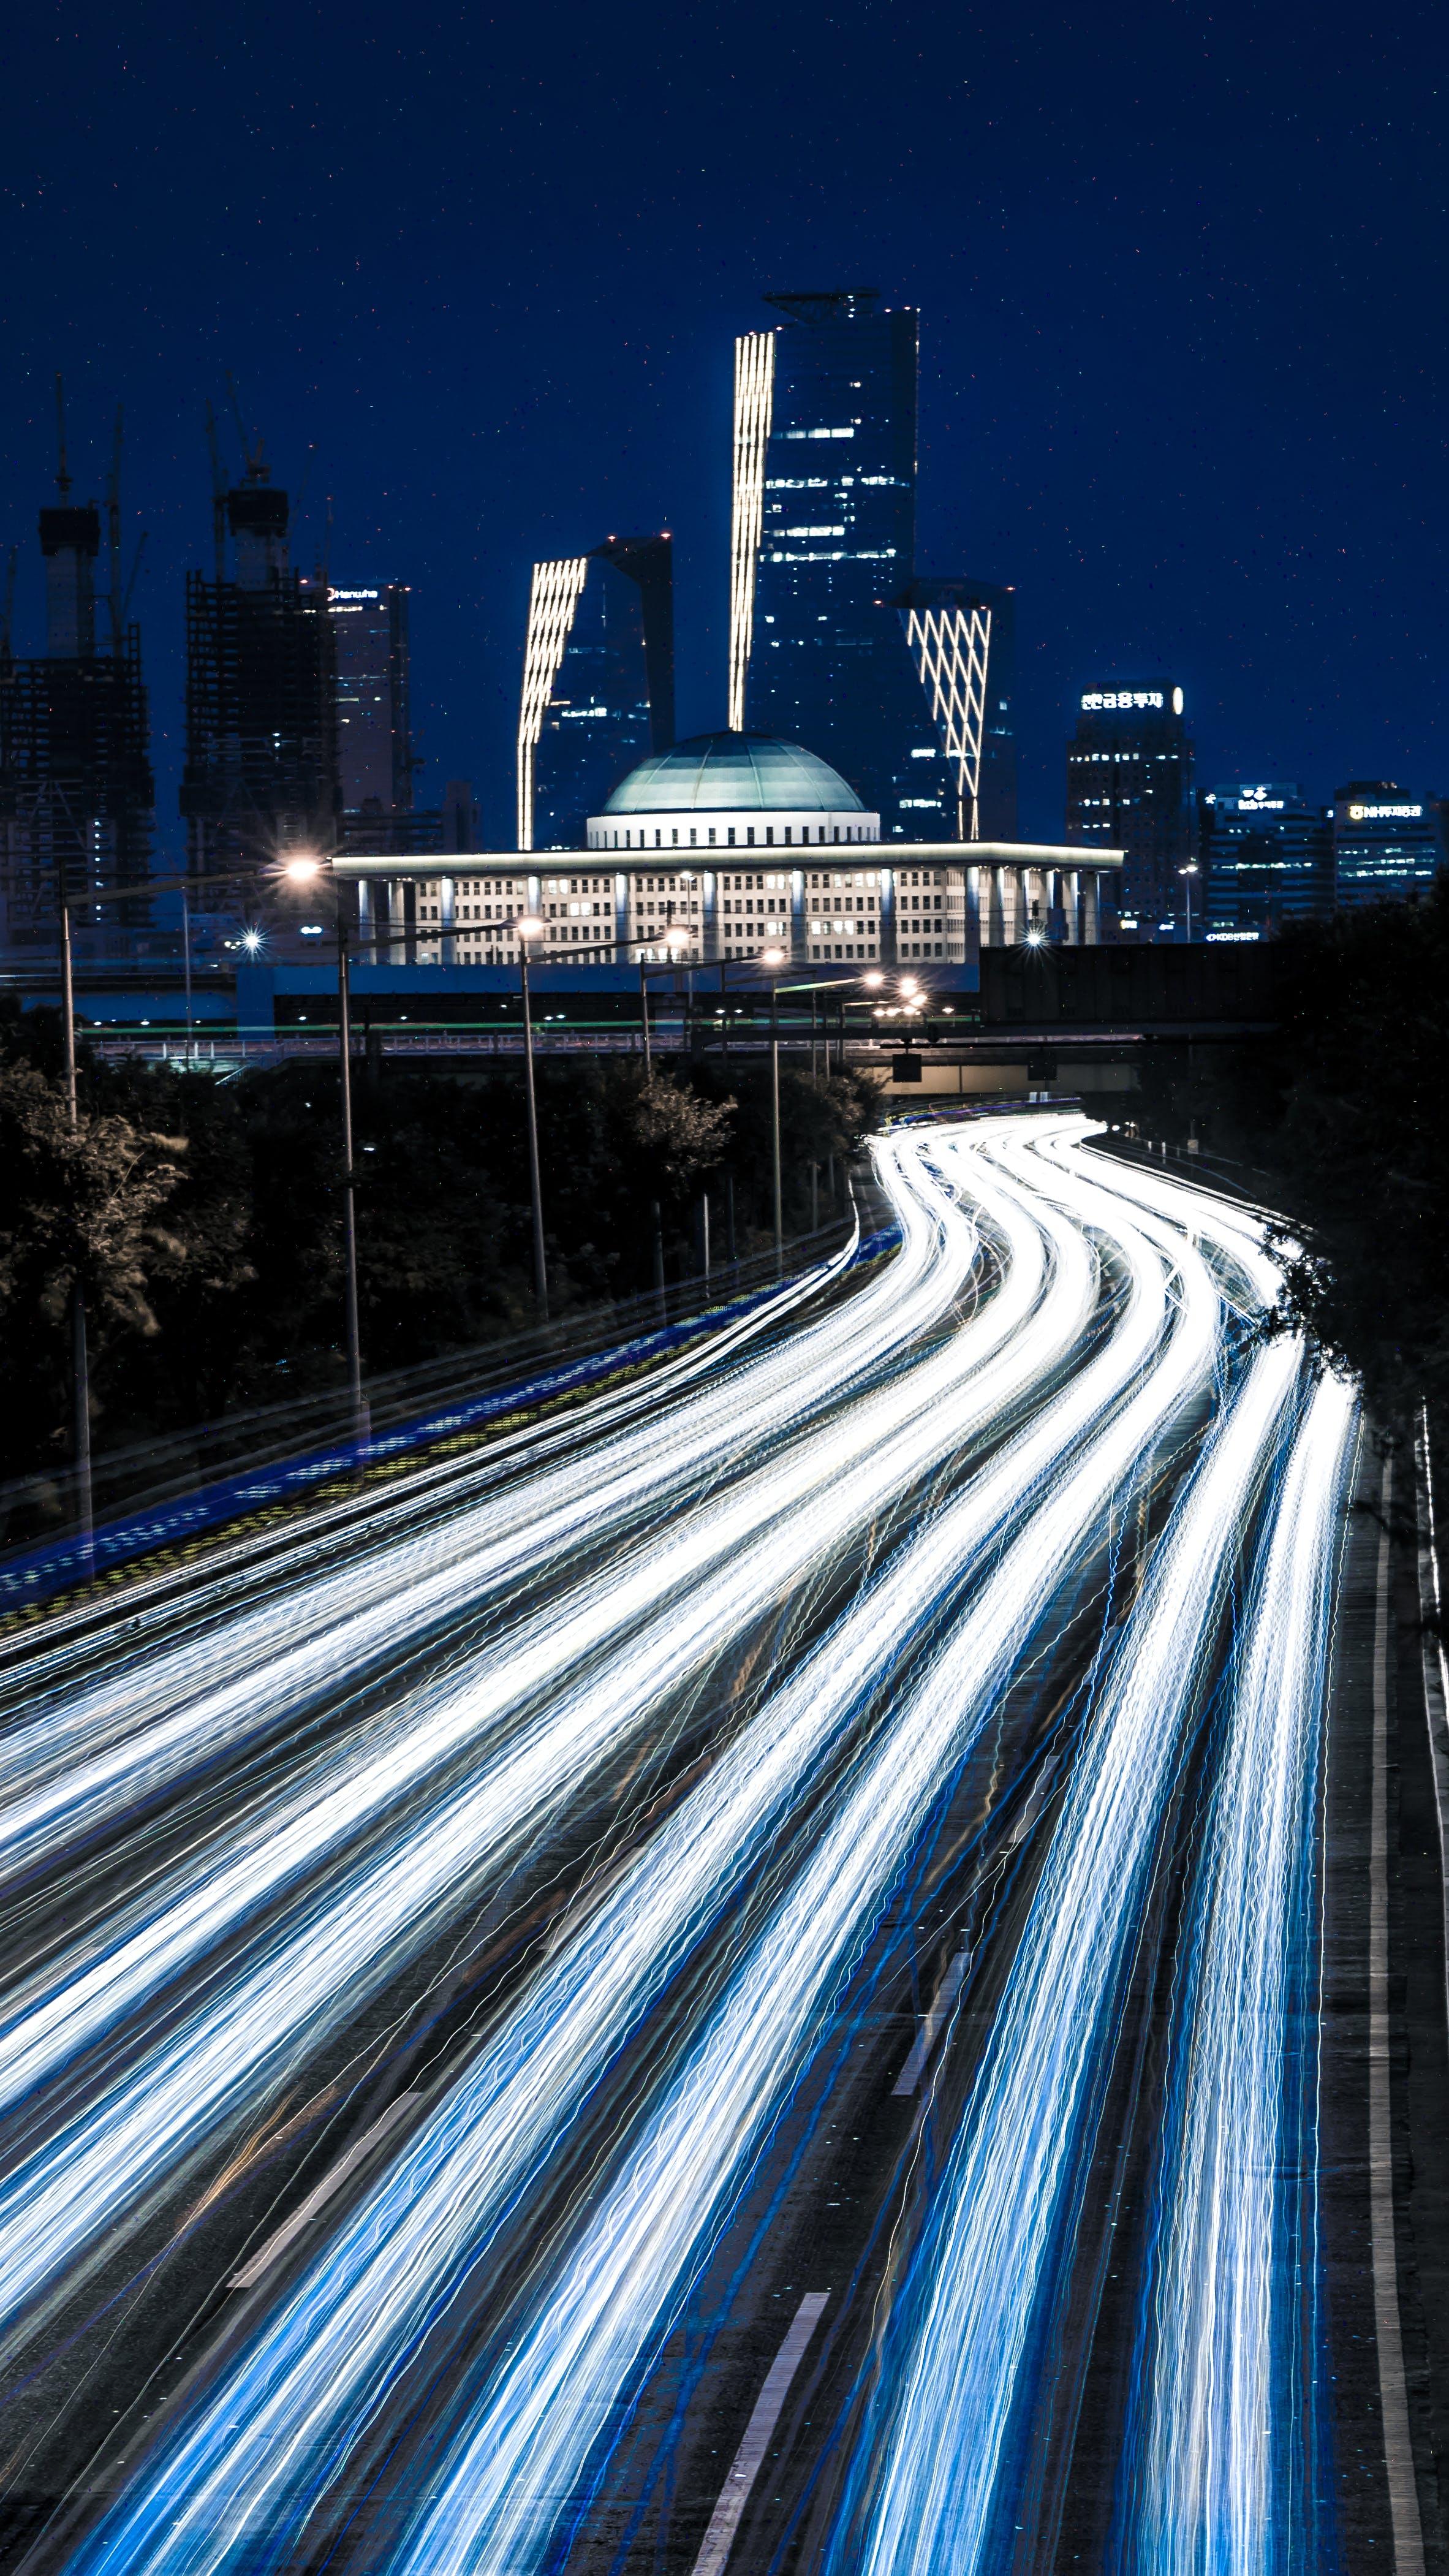 Long Exposure Photo of Road